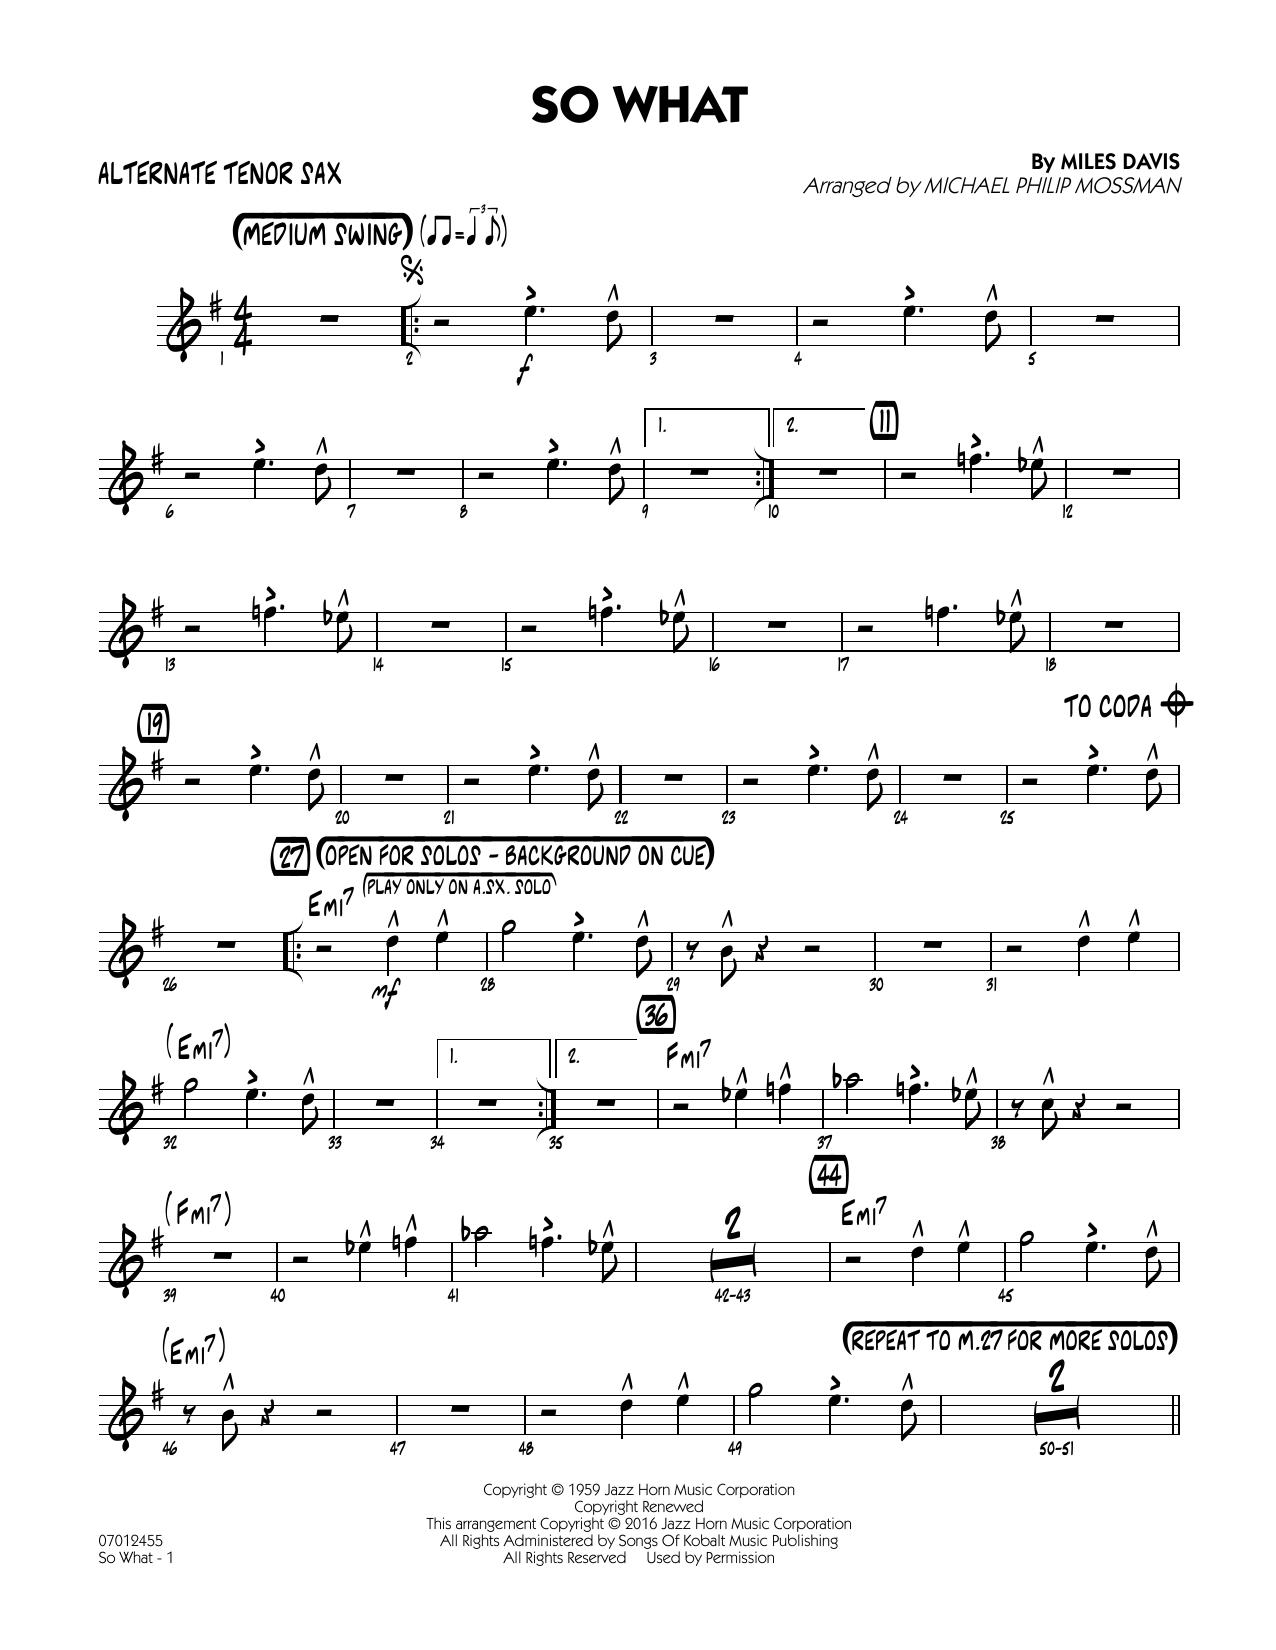 Miles Davis - So What - Alternate Tenor Sax